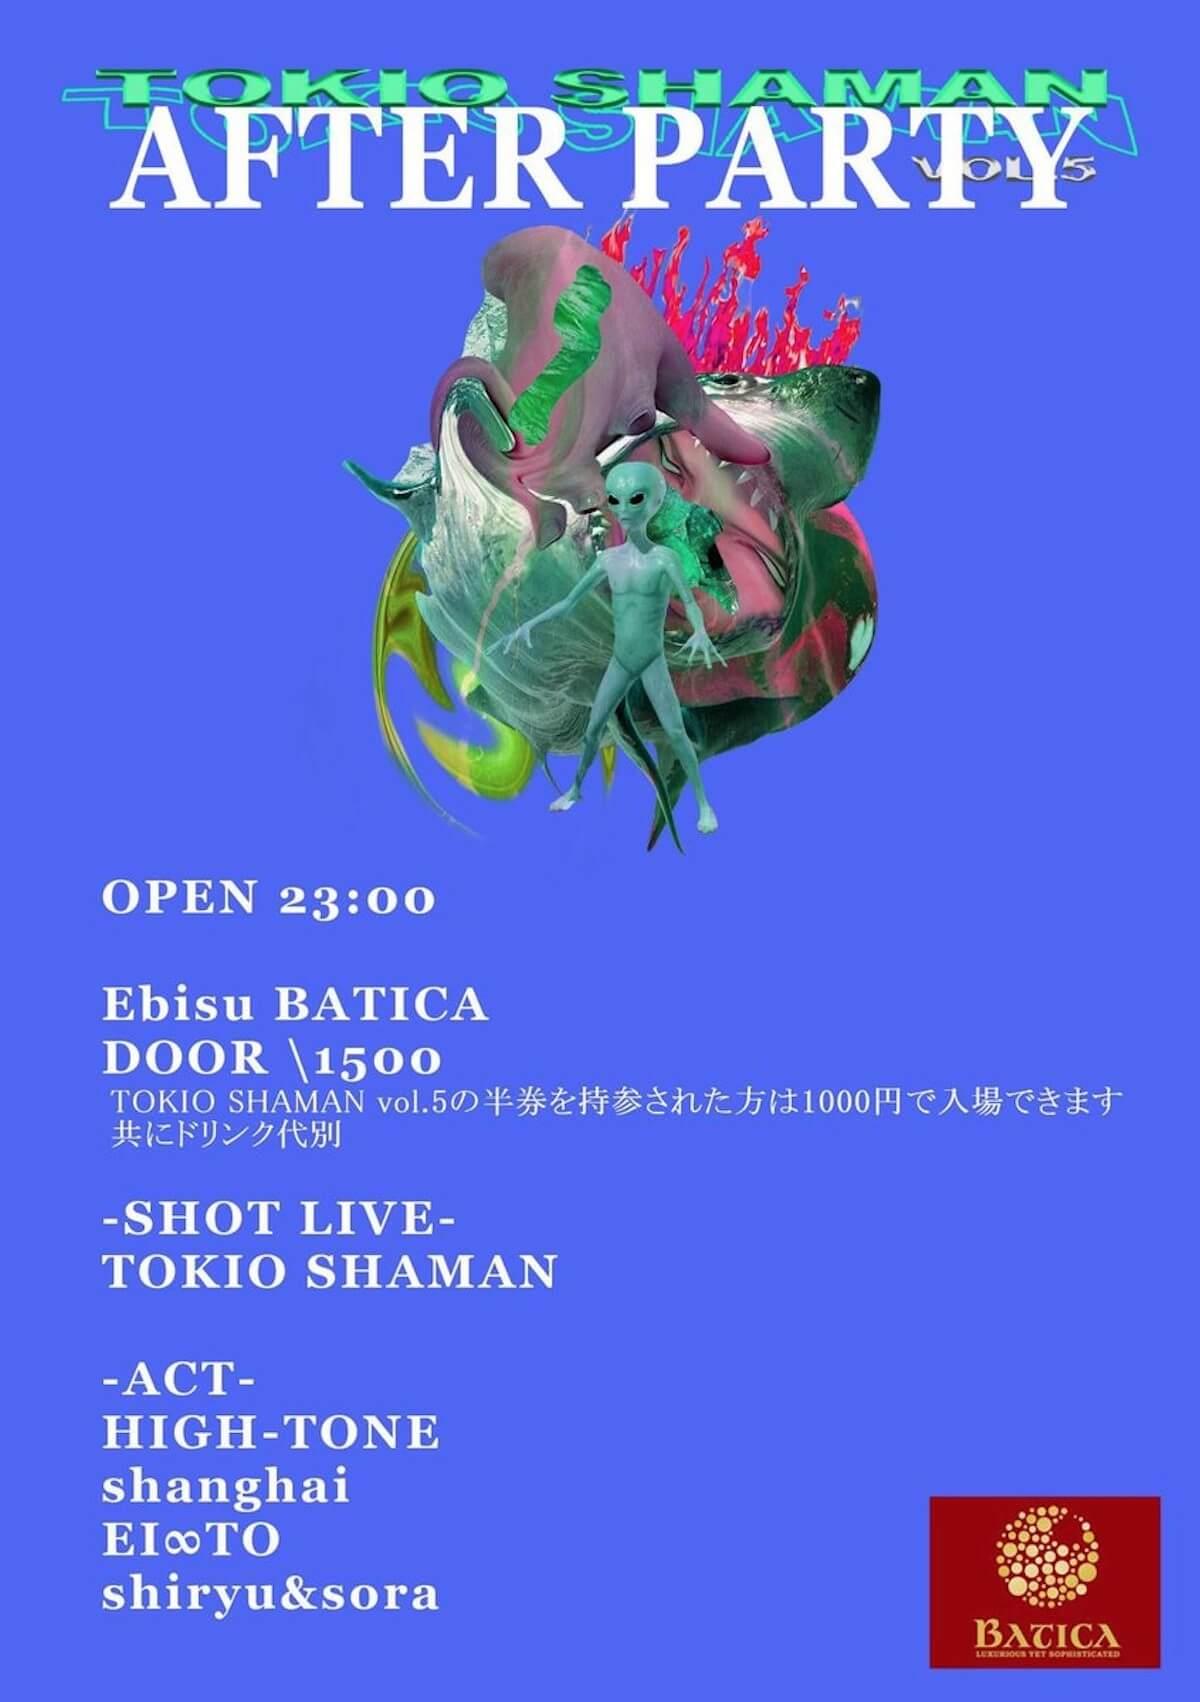 shaka bose 釈迦坊主「TOKIO SHAMAN vol.5」のタイムテーブルが公開&アフターパーティーが本日EBISU BATICAにて急遽開催決定 music190505-tokio-shaman-3